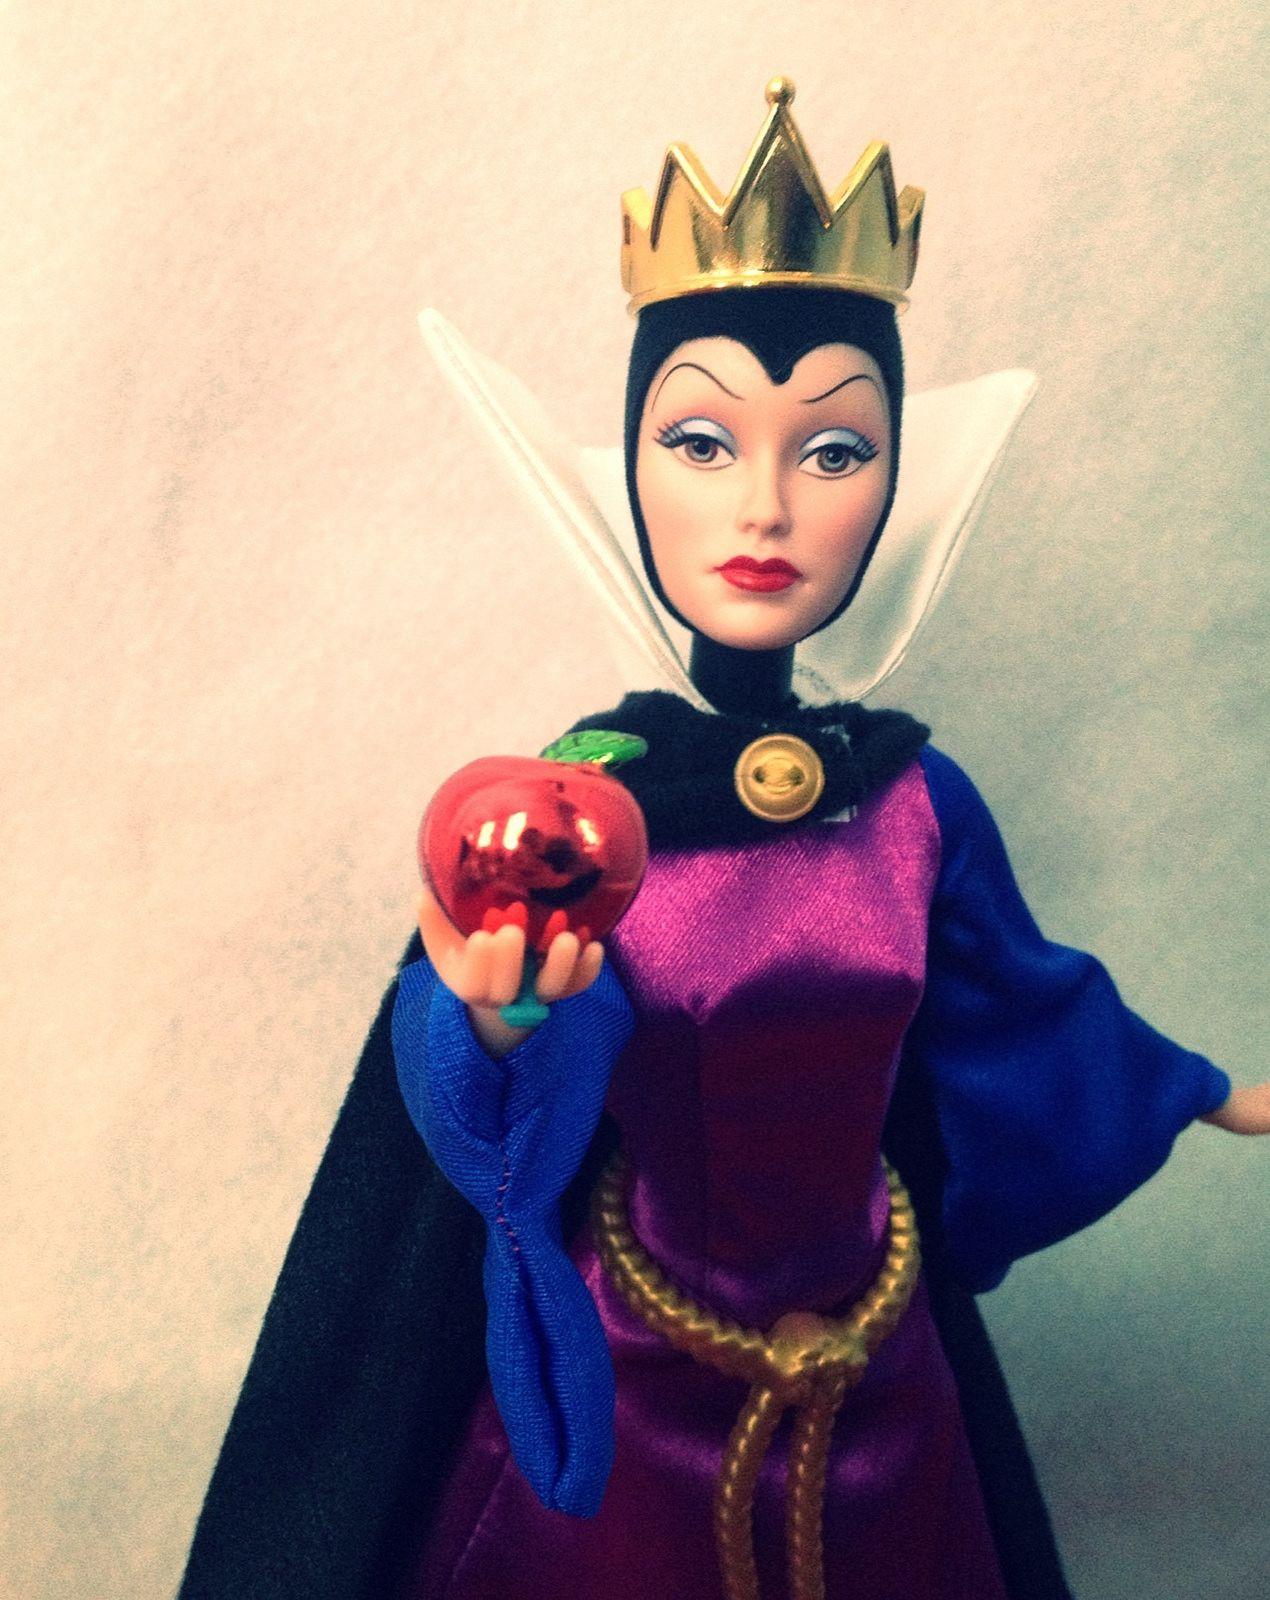 Evil Queen doll | The Evil Queen | Pinterest